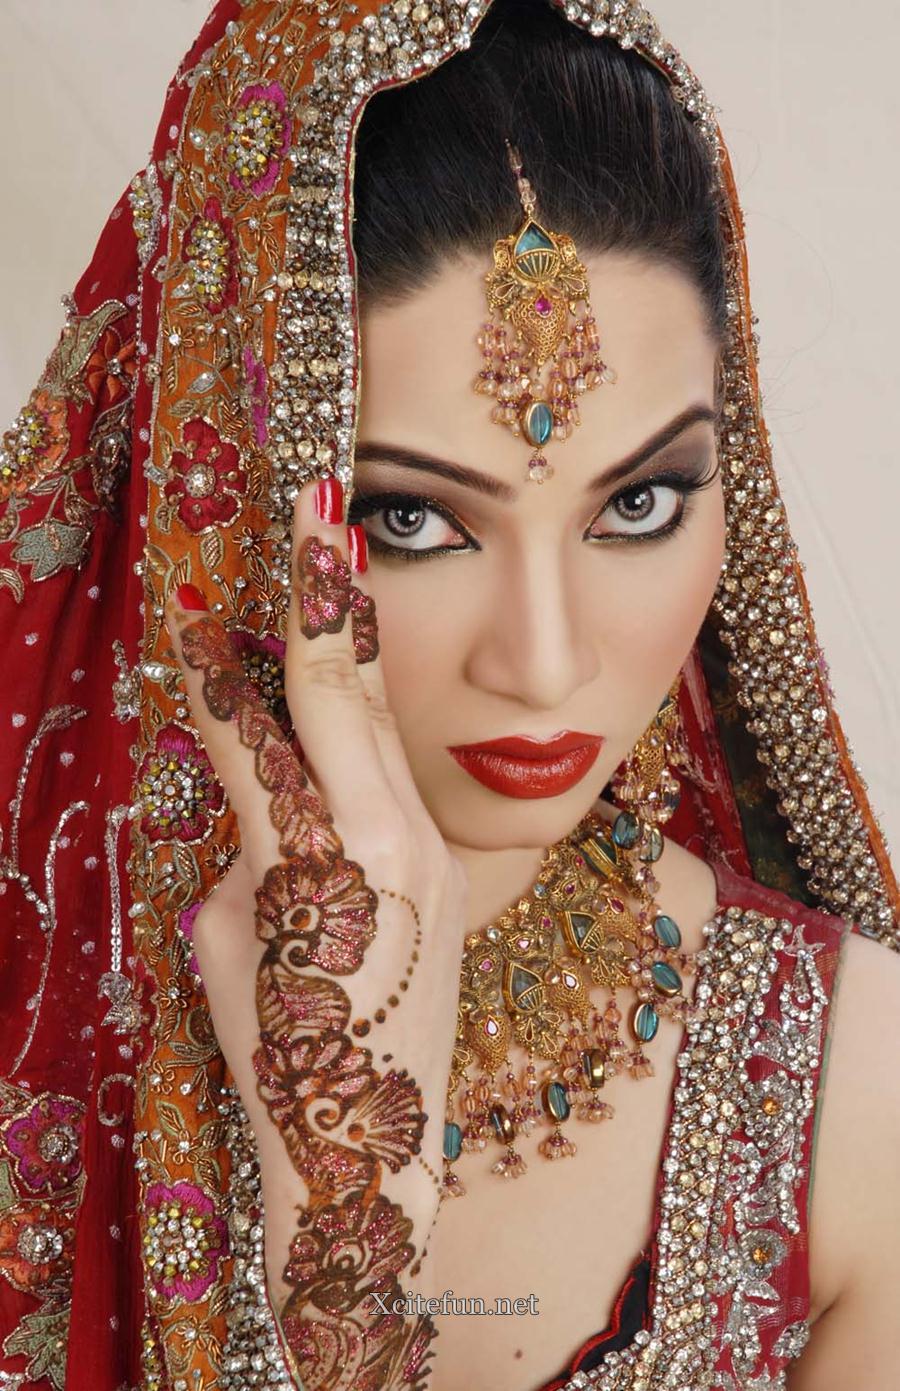 Astonished Pakistani Bridal Makeover - XciteFun.net